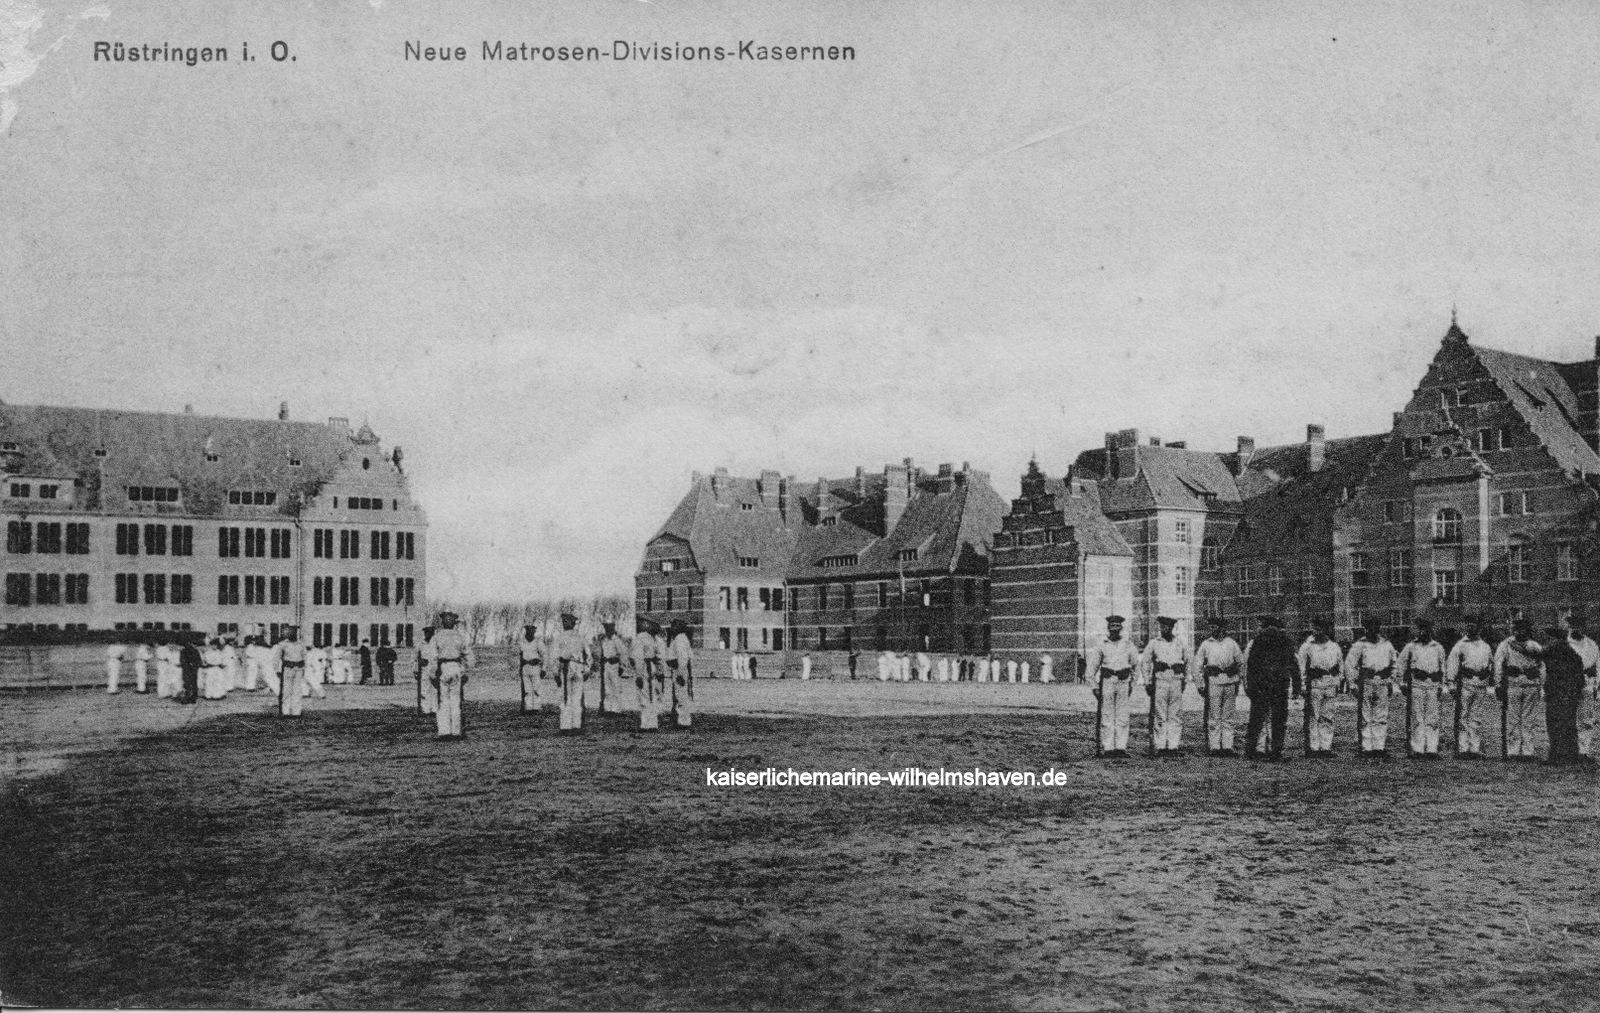 Frauenlob, Stettin, Derfflinger